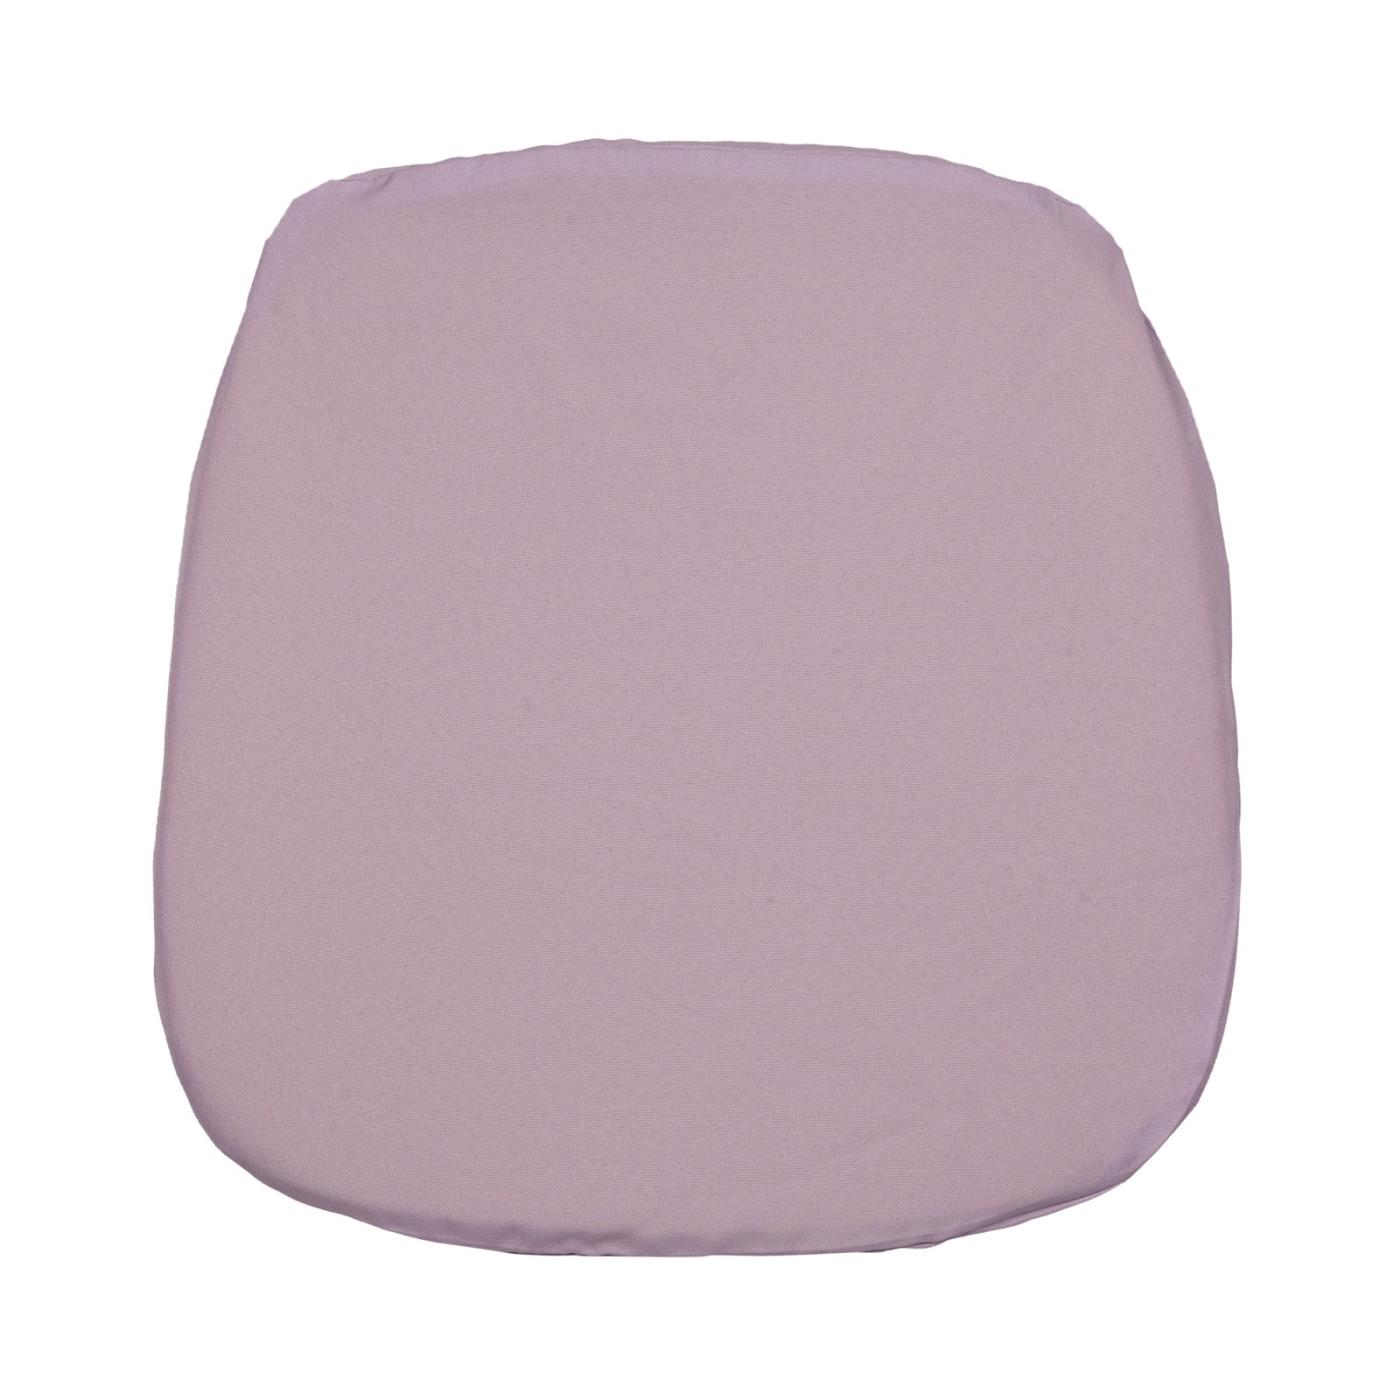 Poly Seat Cushion - Lilac